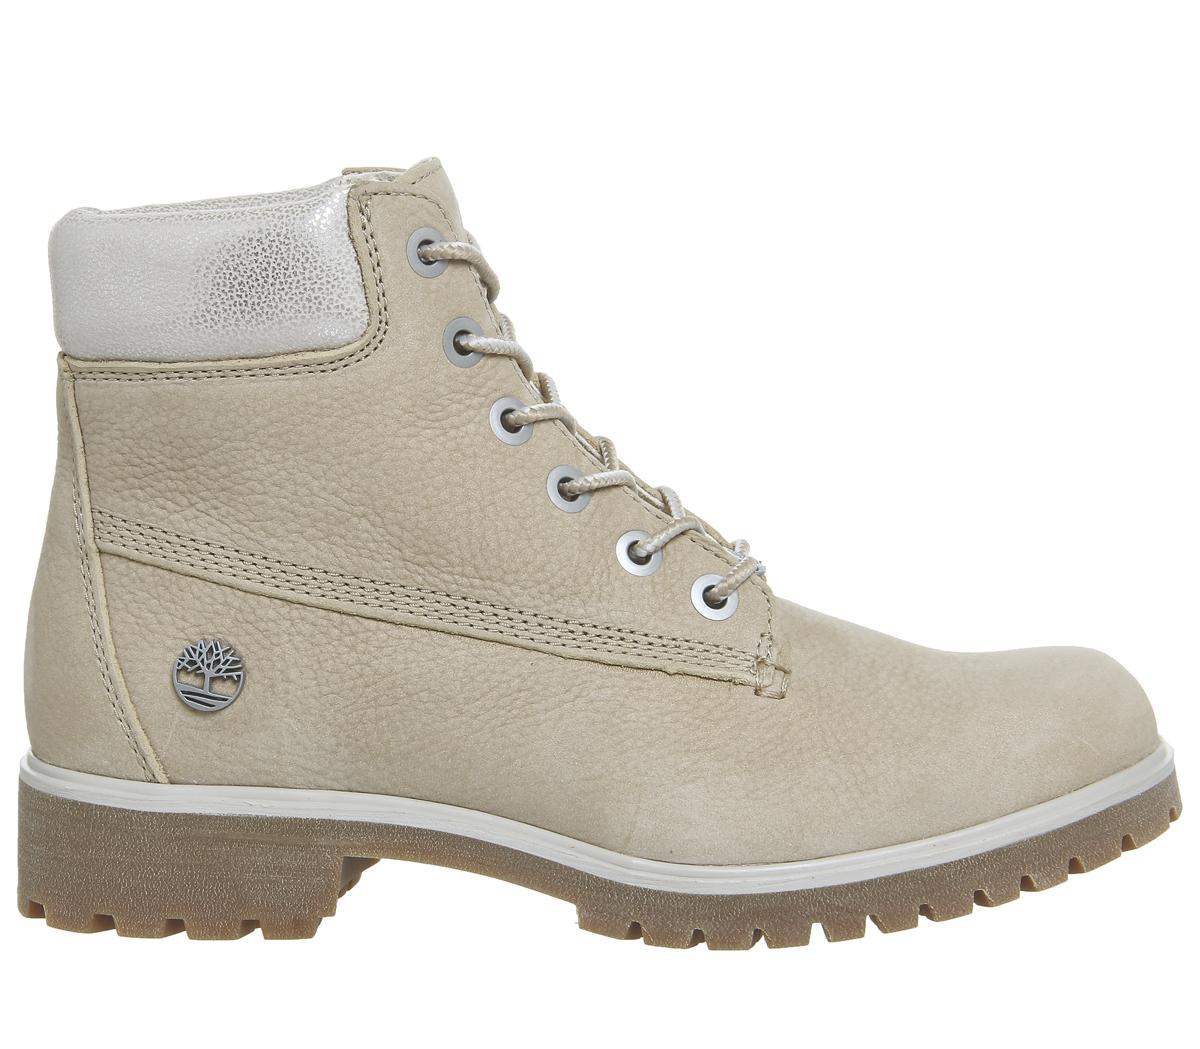 ab2b611565 Sentinel Damen Timberland Slim Premium 6 Inch Boots Grau NOMAD Stiefel